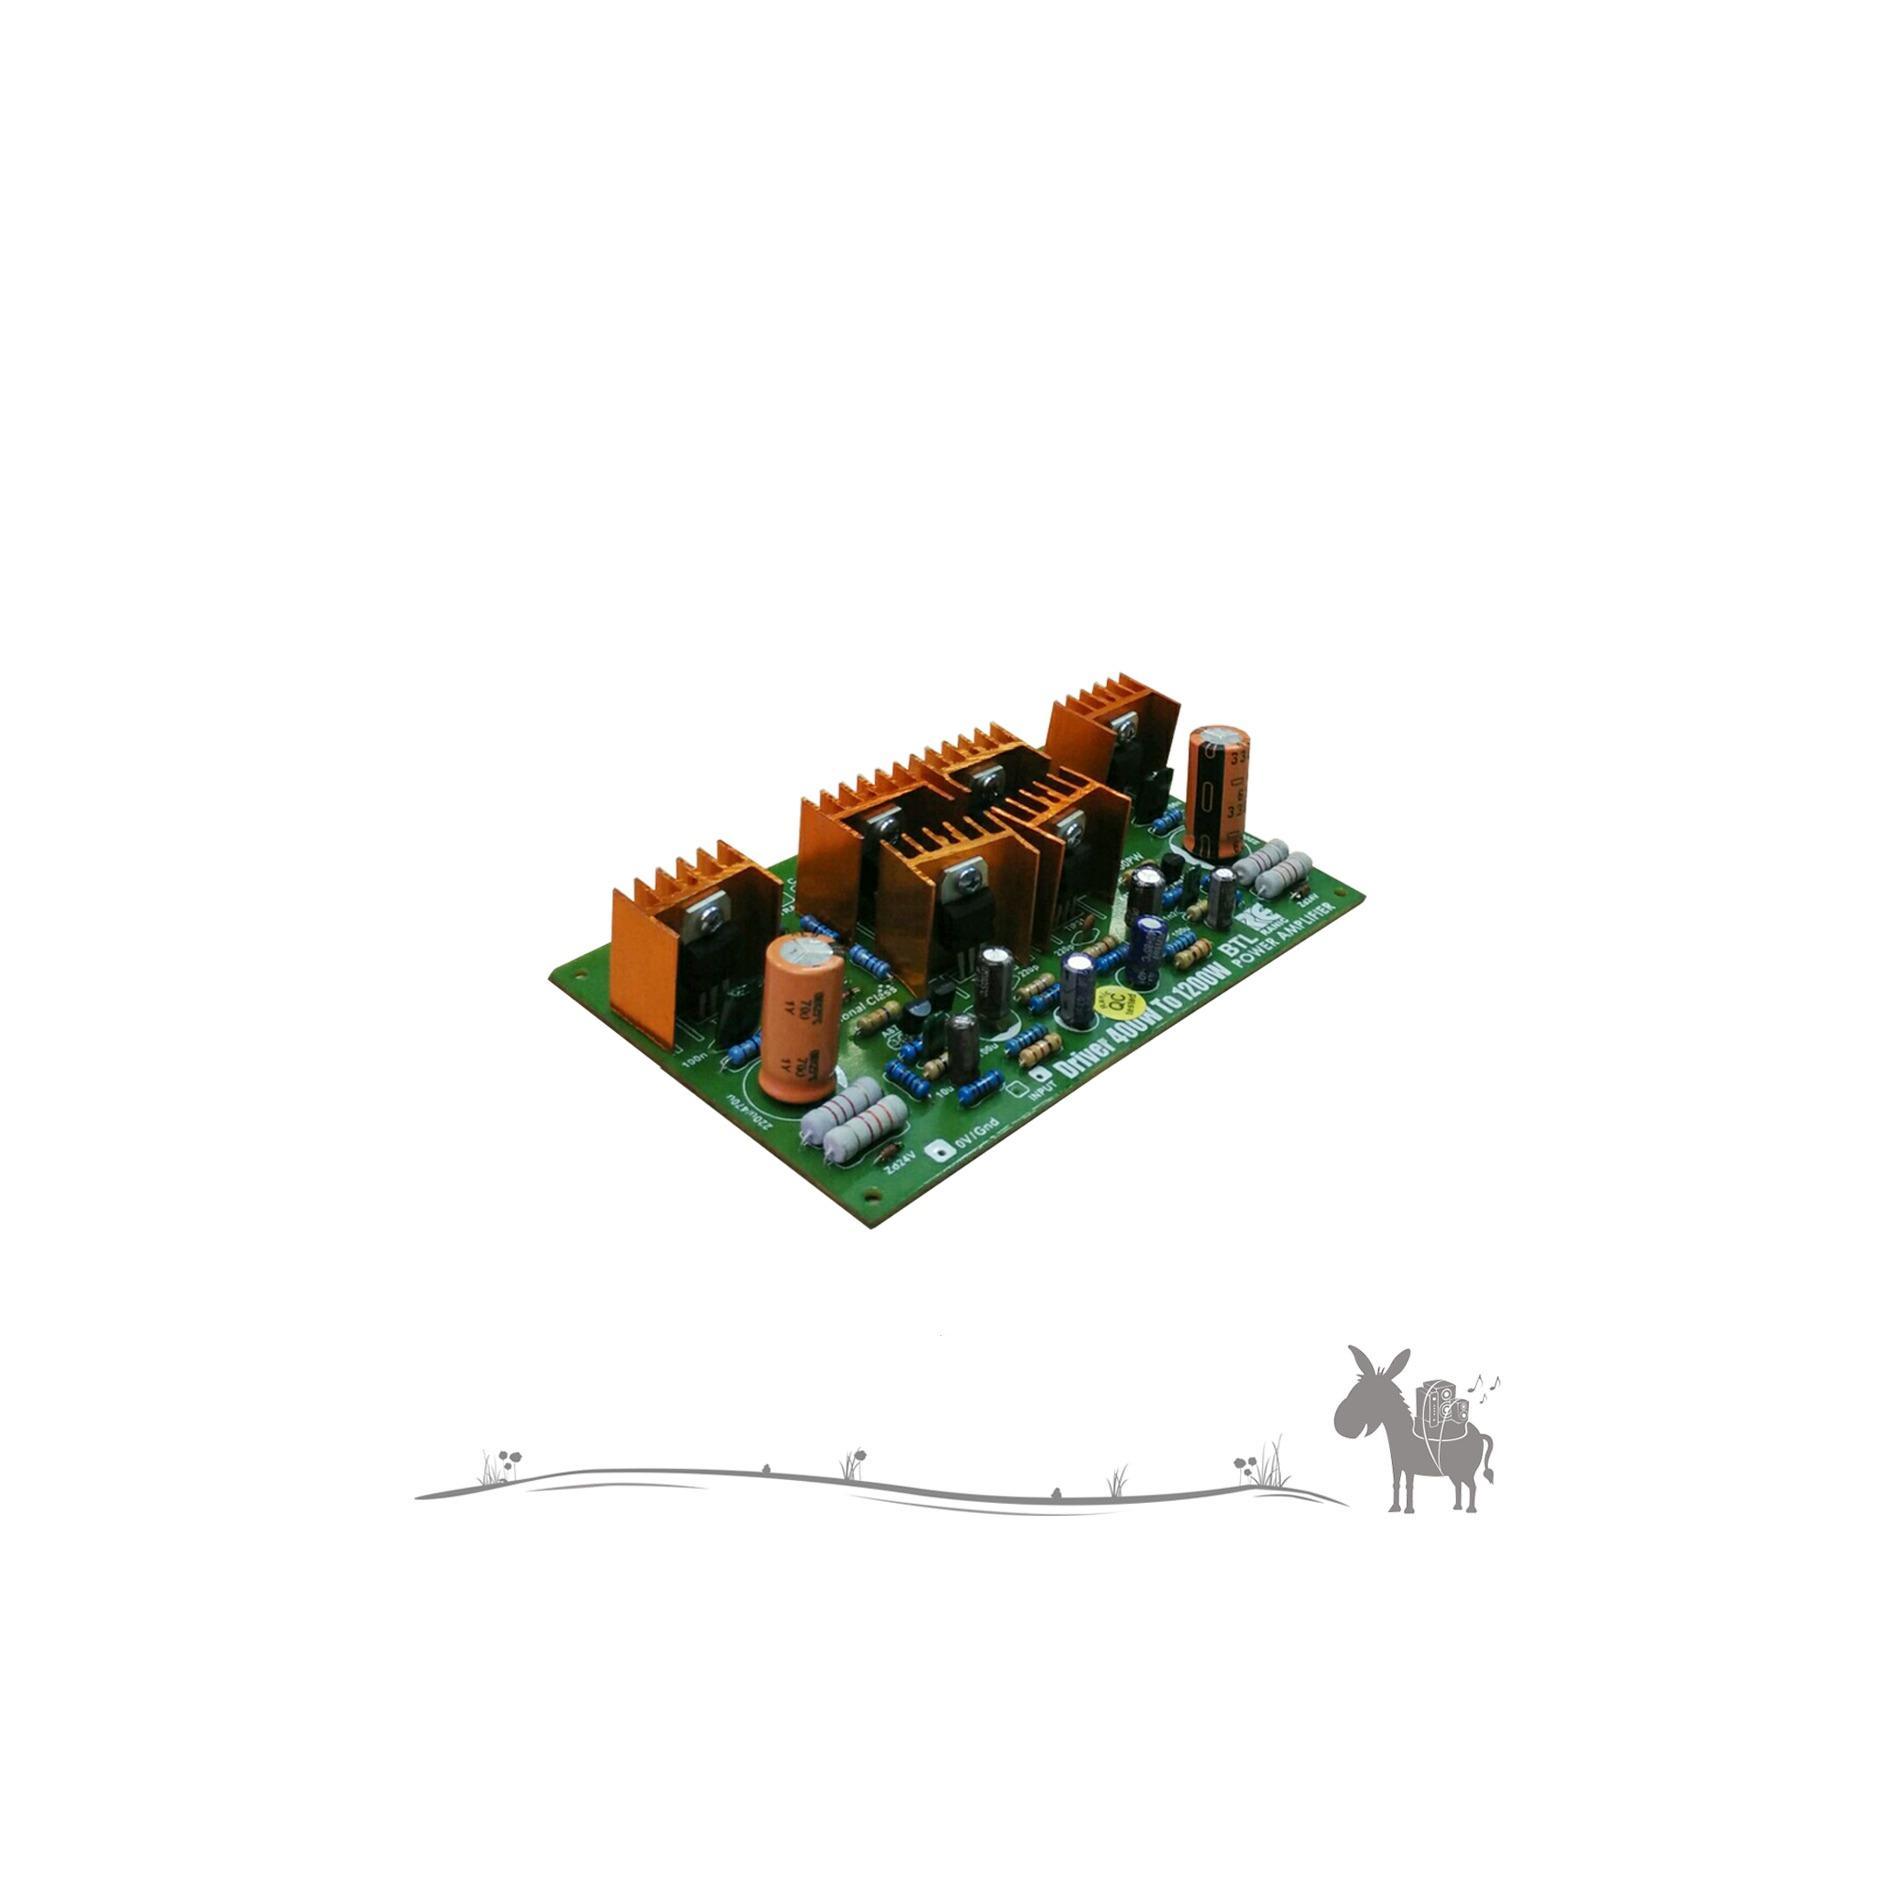 Kehebatan Kit Btl Power Amplifier Mono 400w 3 Tingkat Dan Harga Indonesias Legendary Diy 150w Ocl Gambar Produk Lengkap